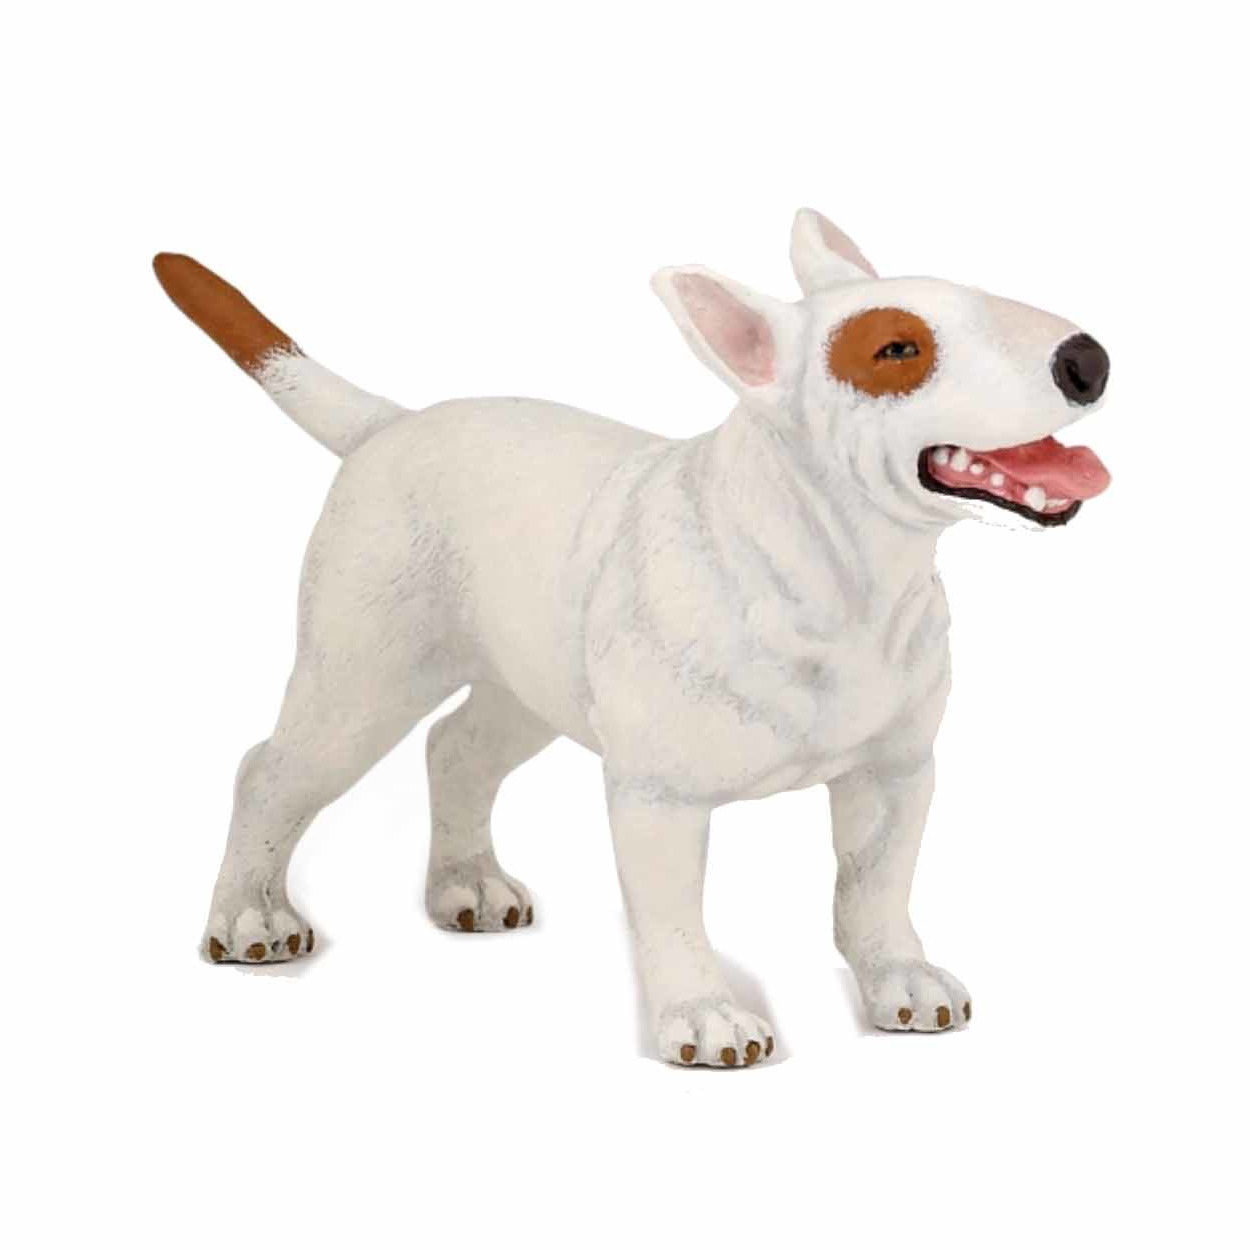 Plastic speelgoed figuur Bull Terrier 9 cm